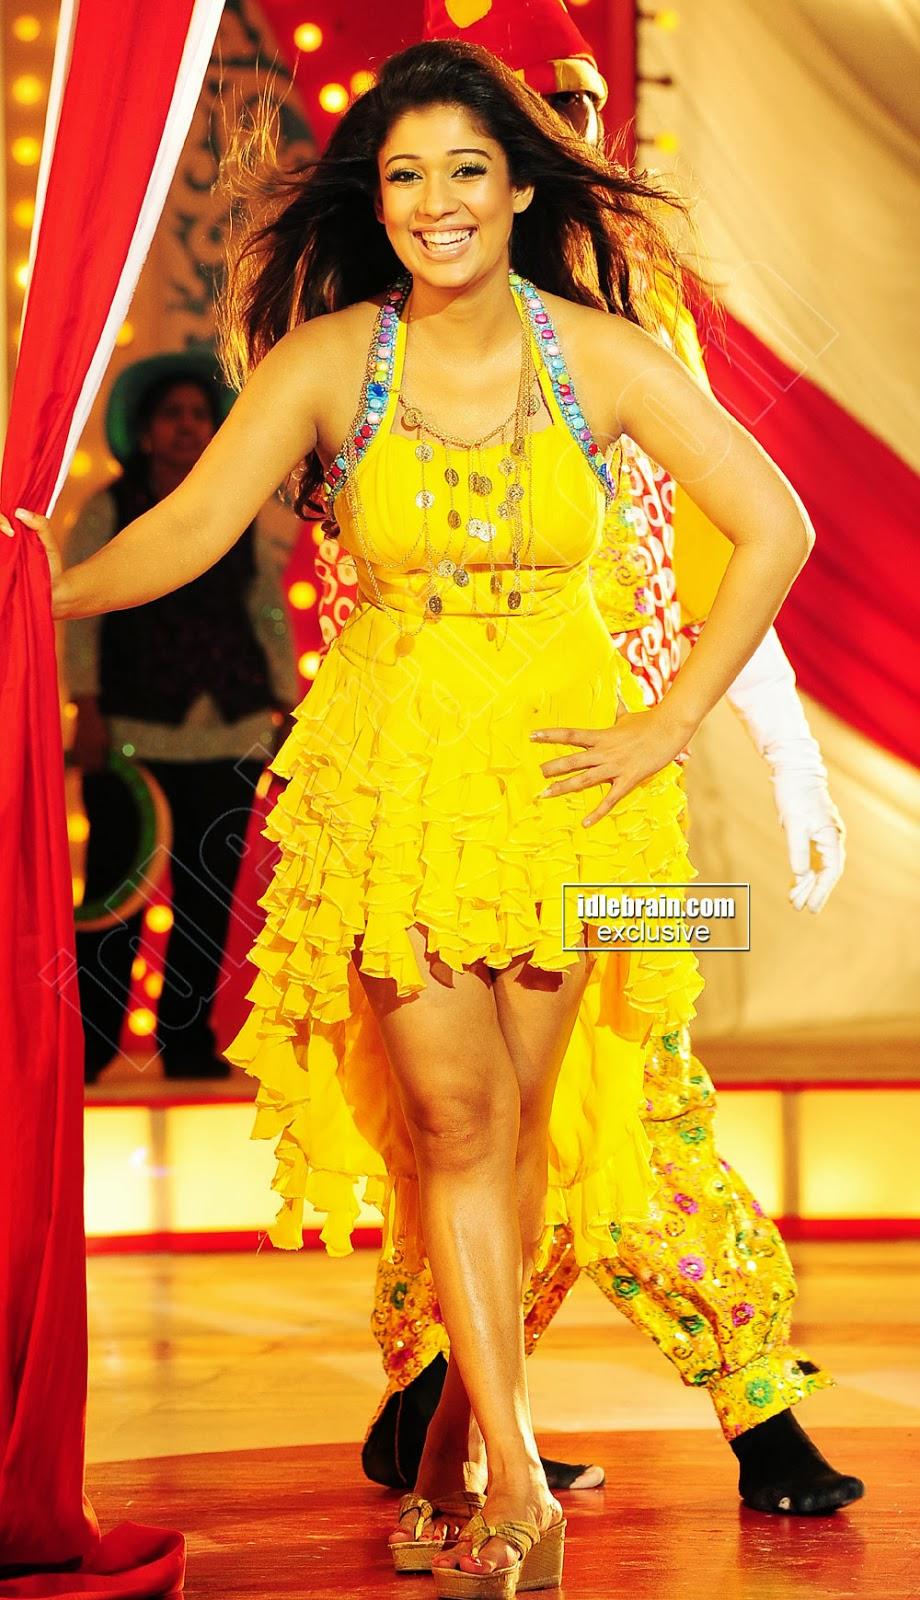 hot movie stills nayanthara hot bikini stills nayanthara hot stills